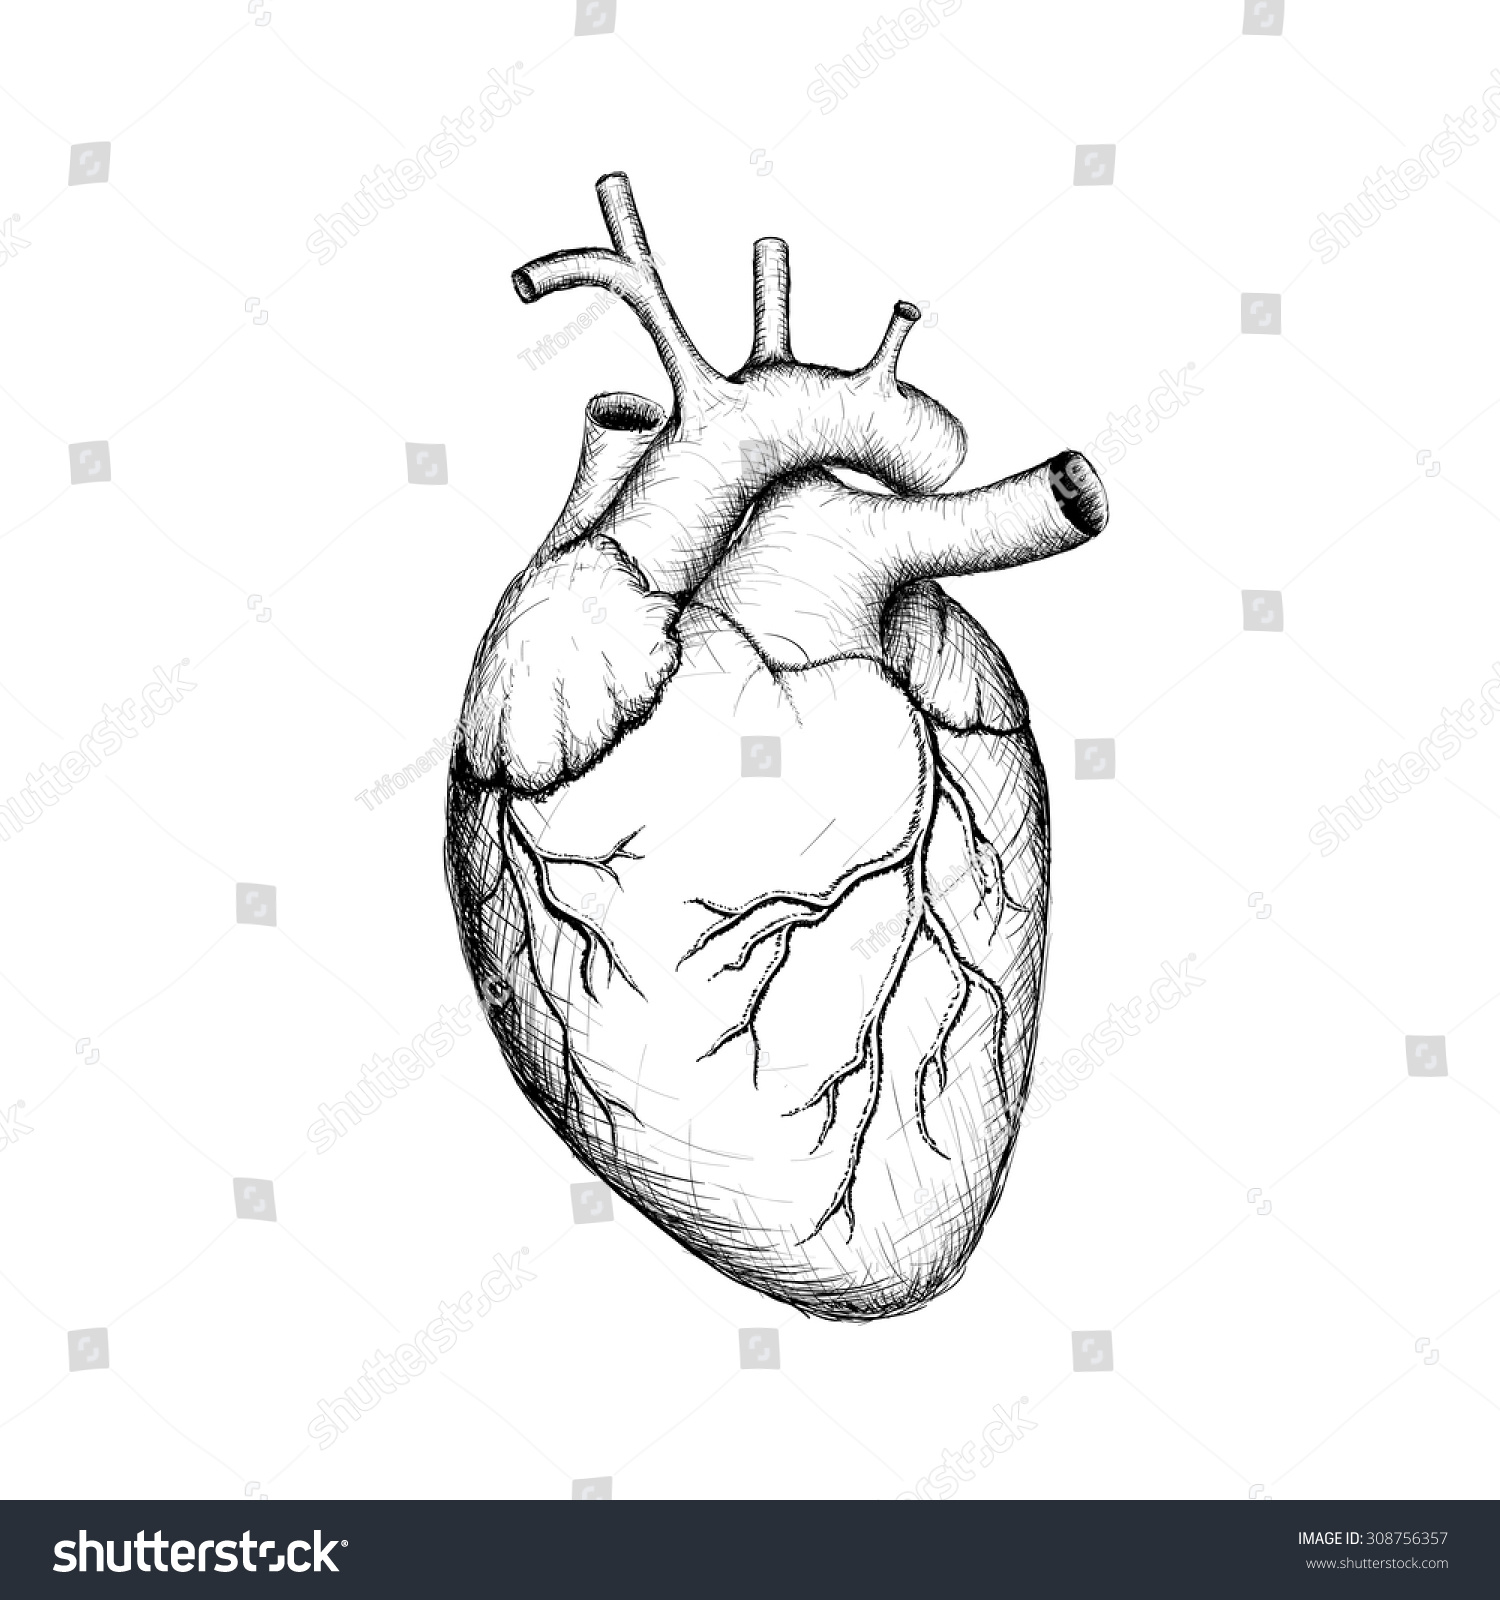 Royalty Free Human Heart Internal Organs Anatomy 308756357